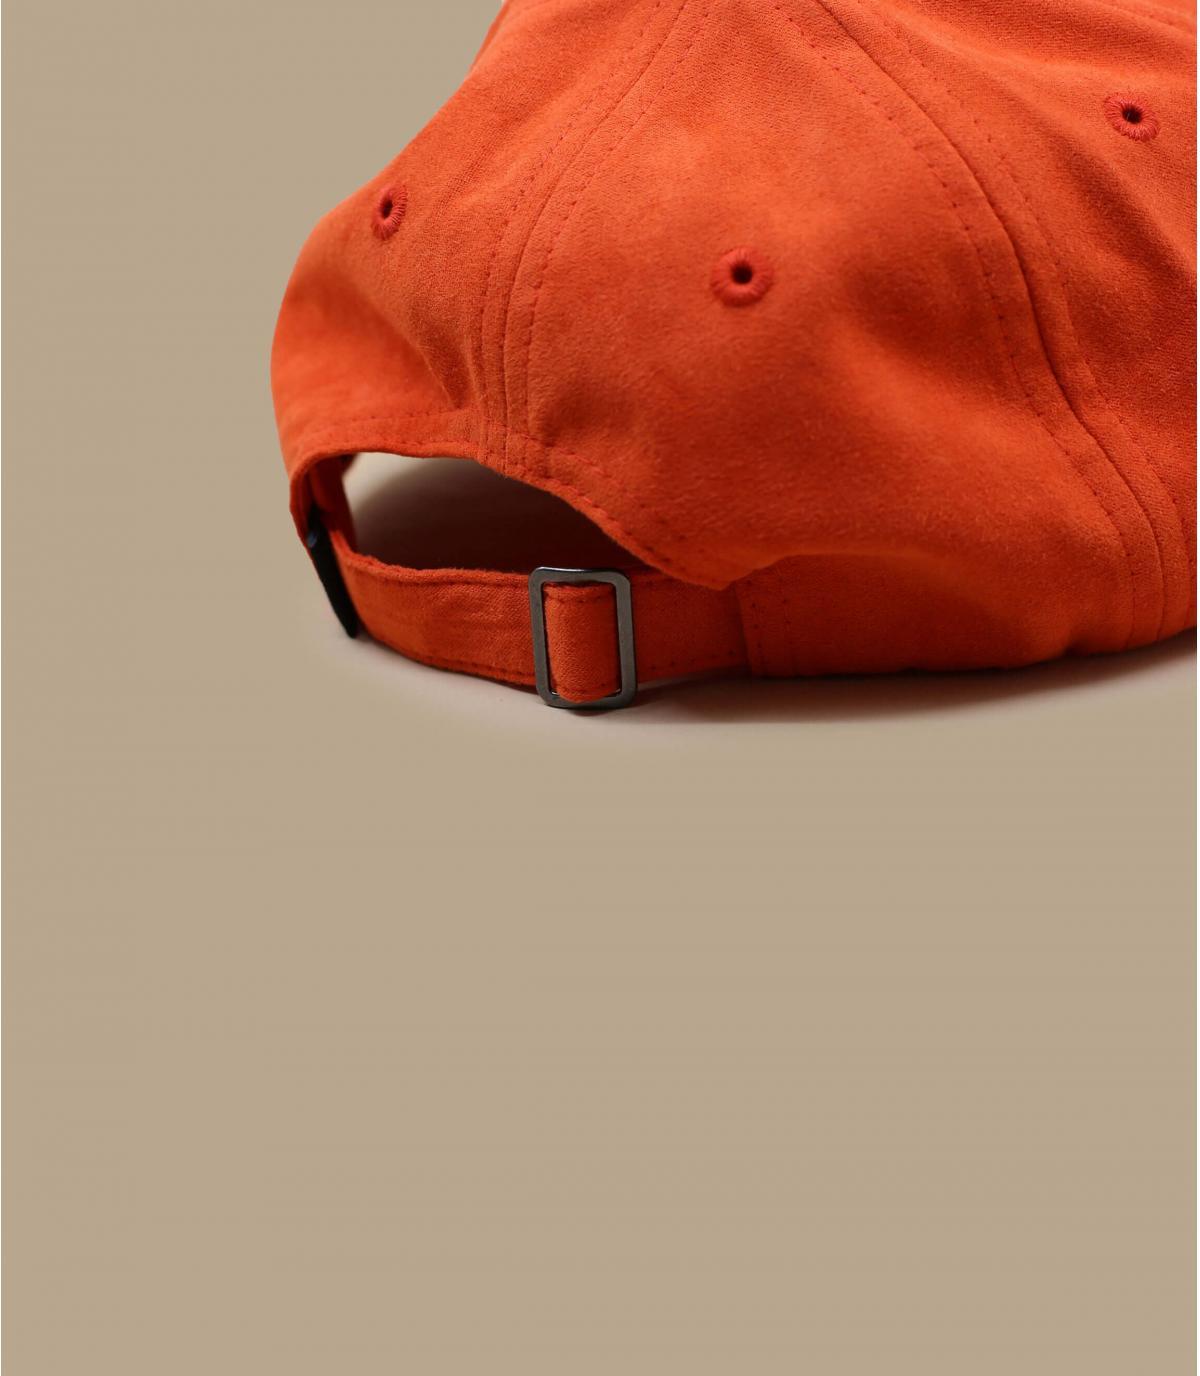 Details Sign Ball orange - Abbildung 4